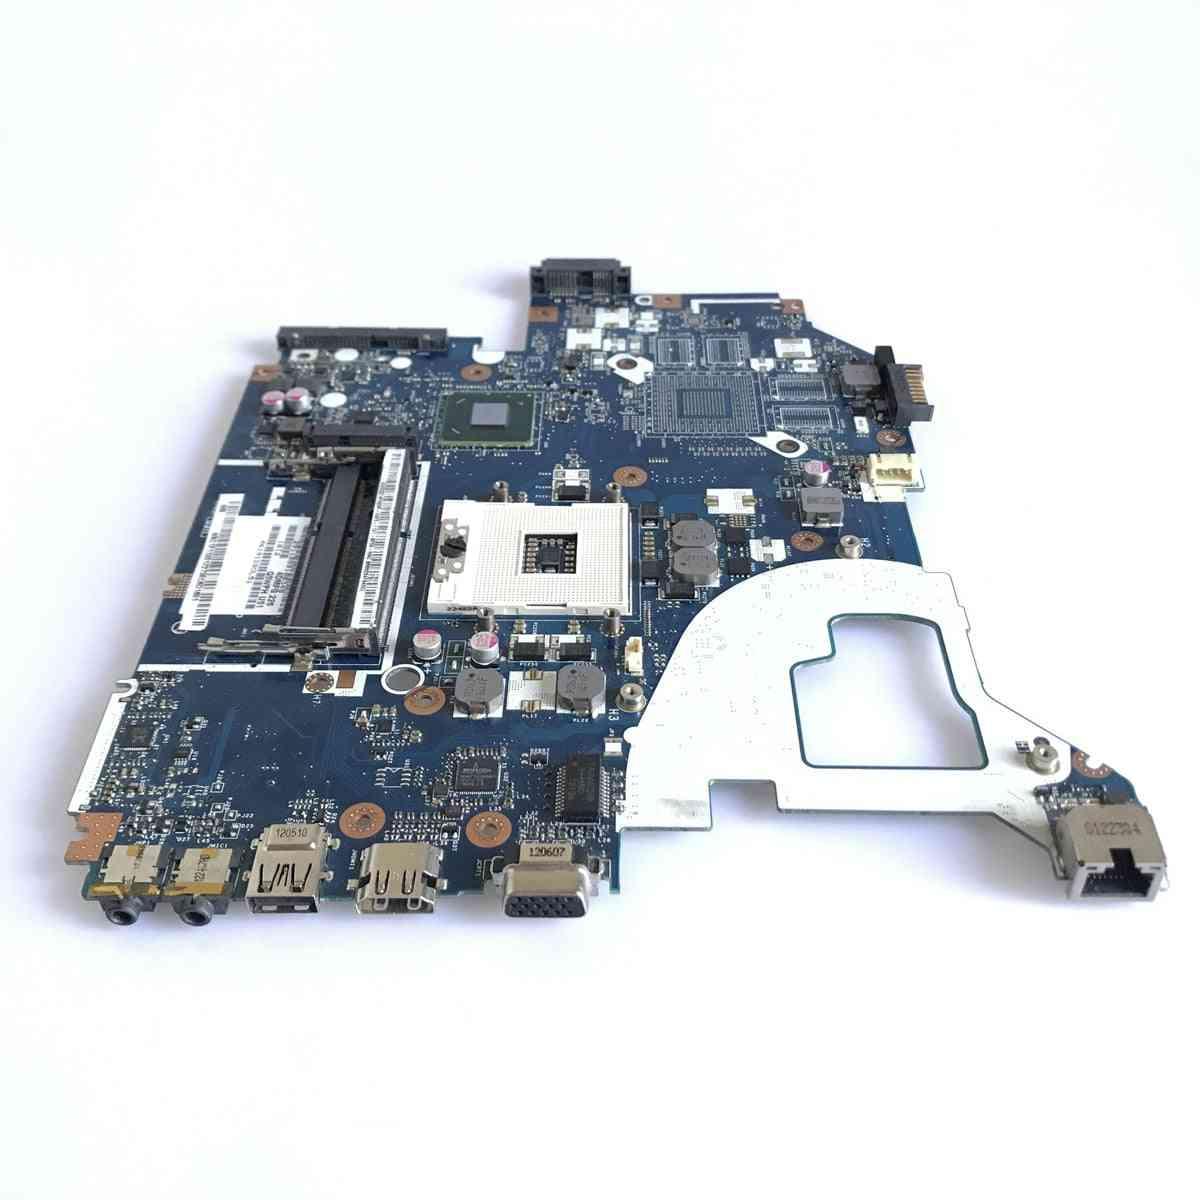 Q5wvh Q5wv1 La-7912p For Acer Aspire E1-571g V3-571g Ne56r V3-571 E1-531 Motherboard Nbc1f11001 Sjtnv Hm70 Ddr3